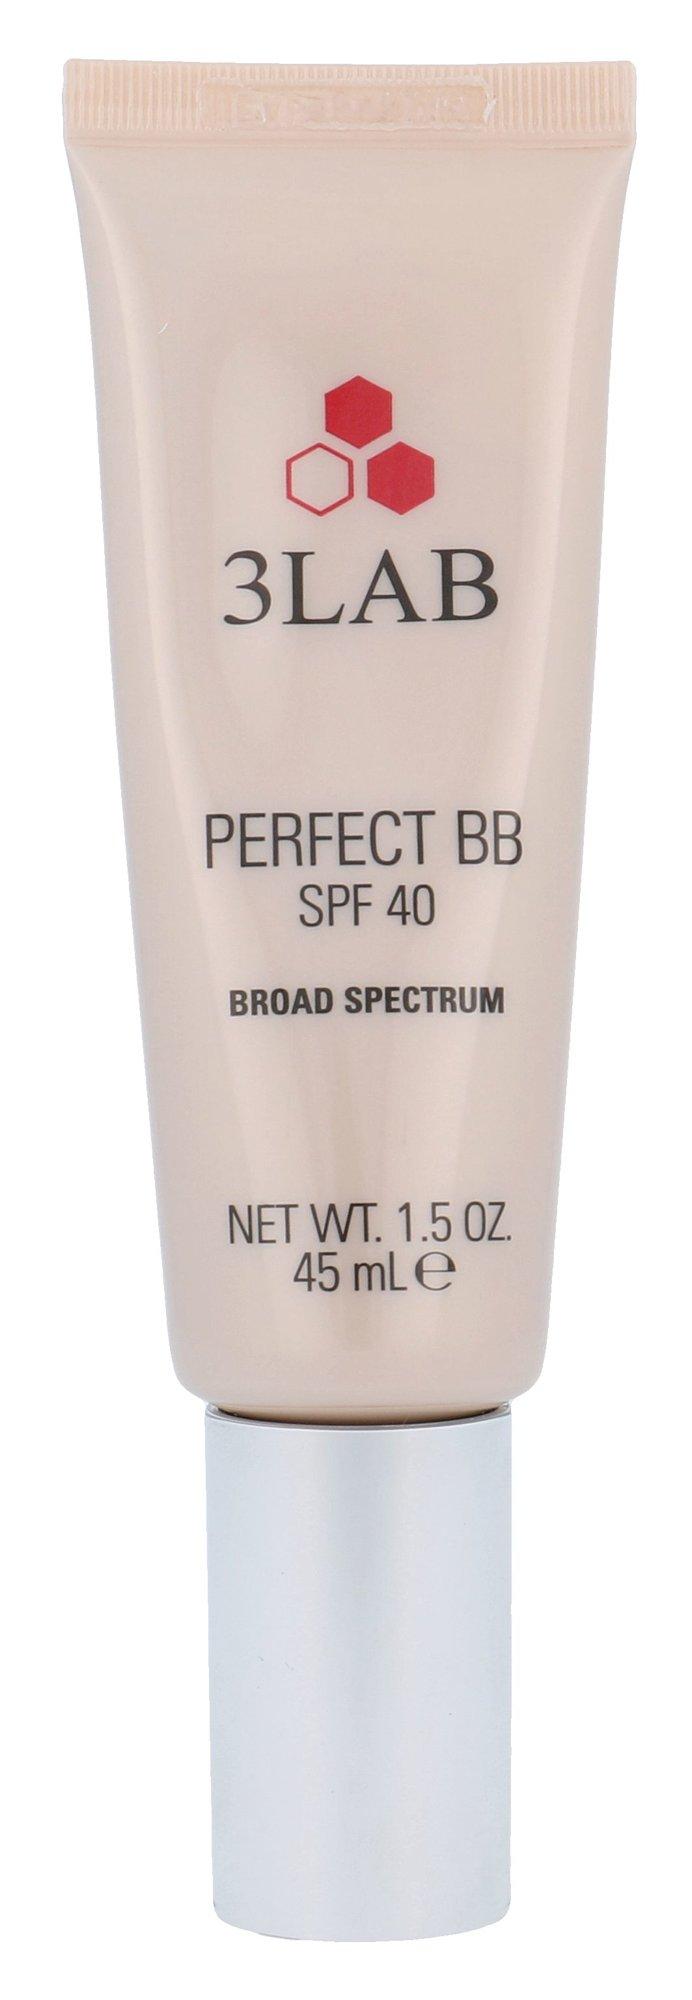 3LAB Perfect BB SPF40 Broad Spectrum Cosmetic 45ml 01 BB Cream SPF40